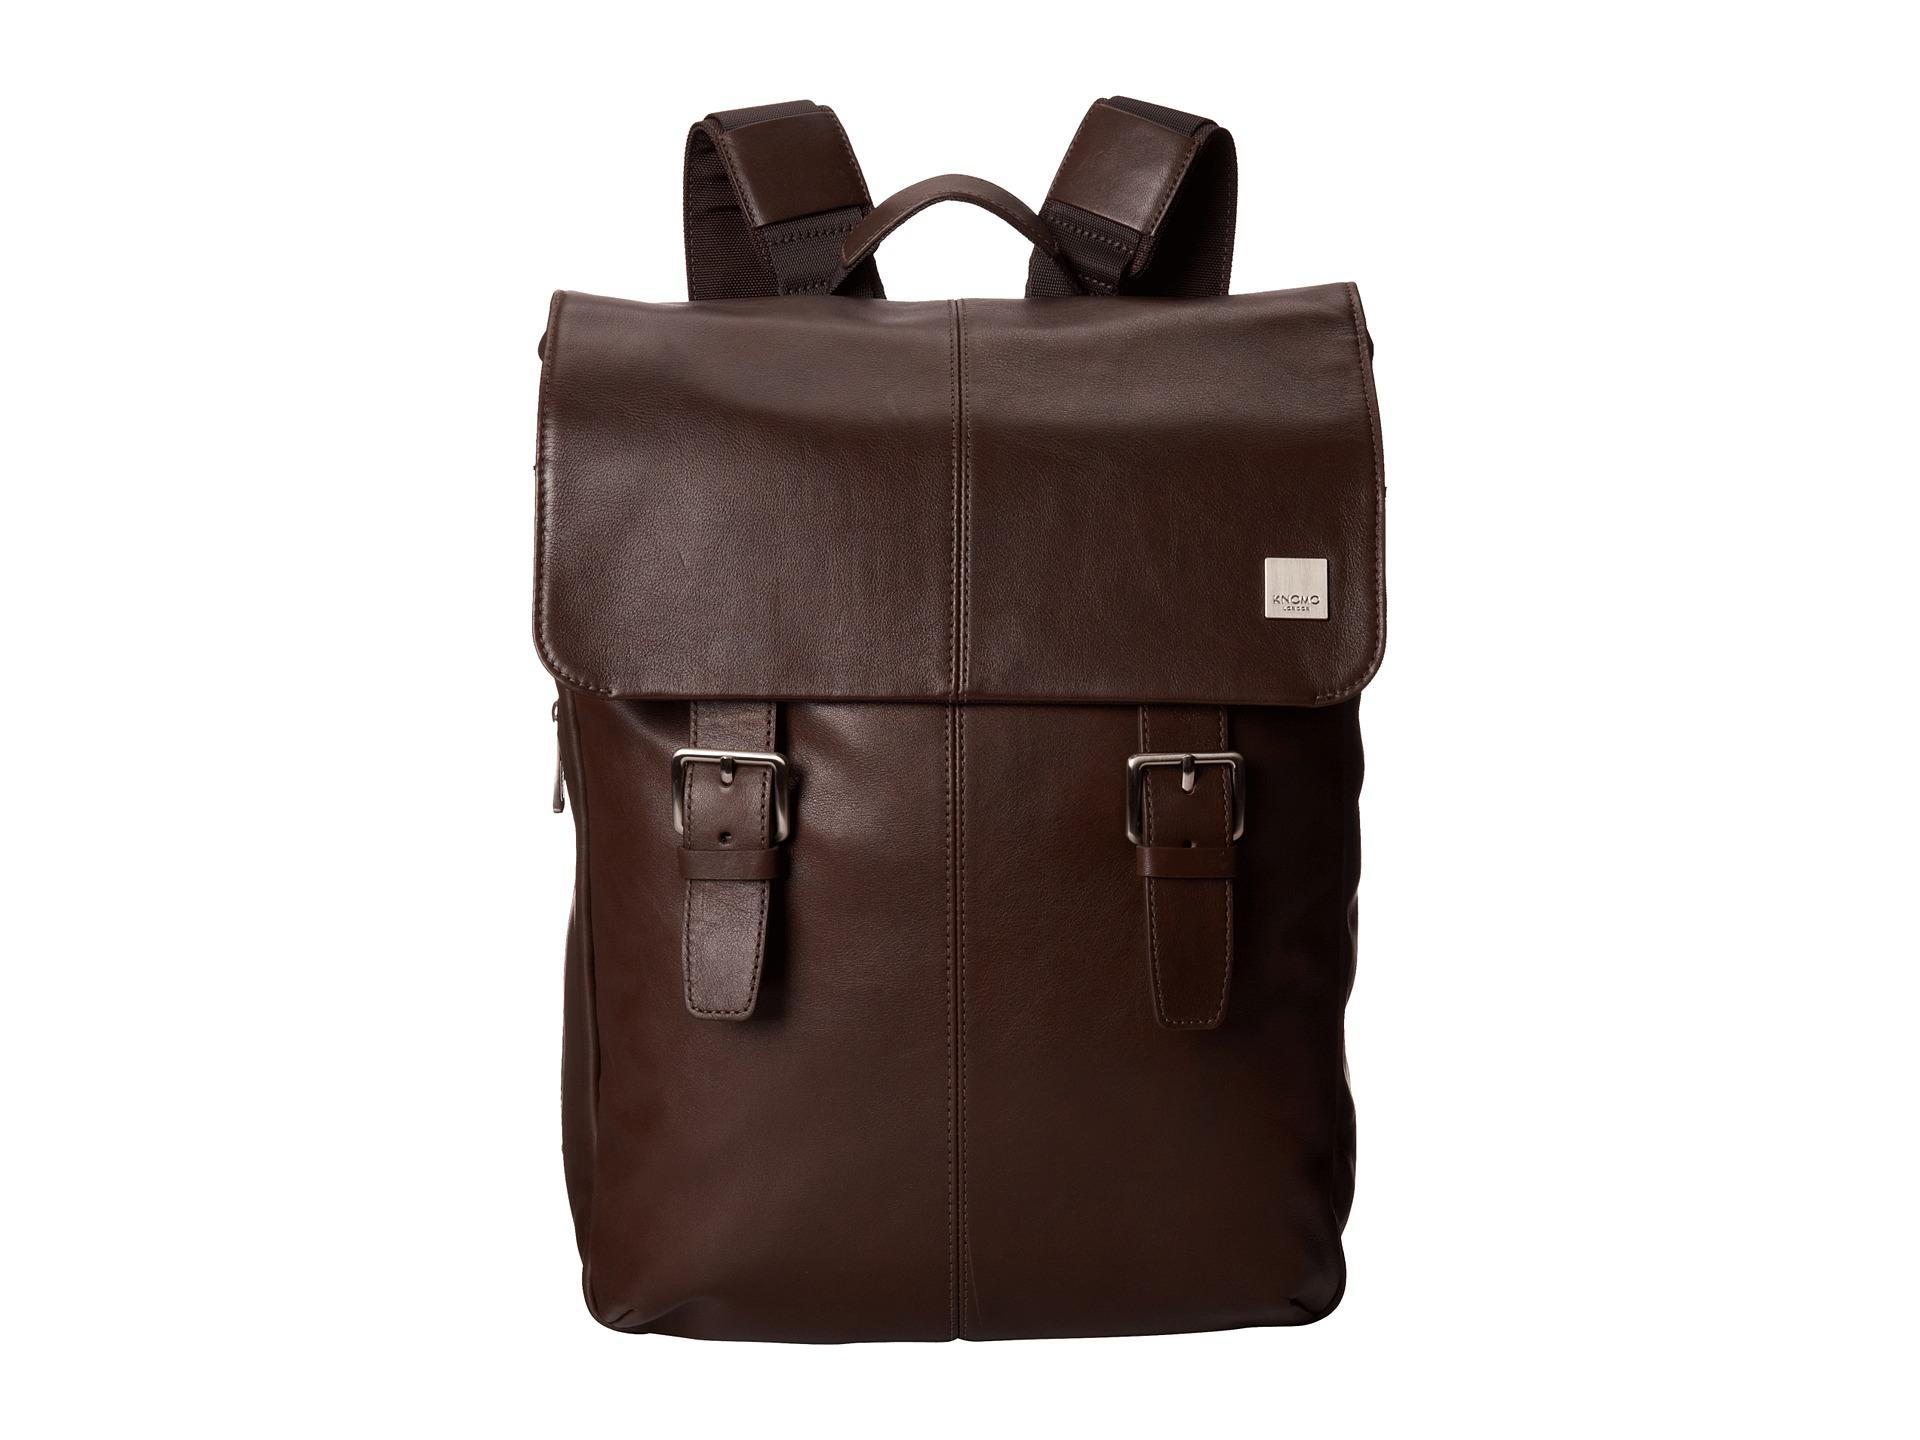 Best Laptop Backpack For Professionals - Crazy Backpacks